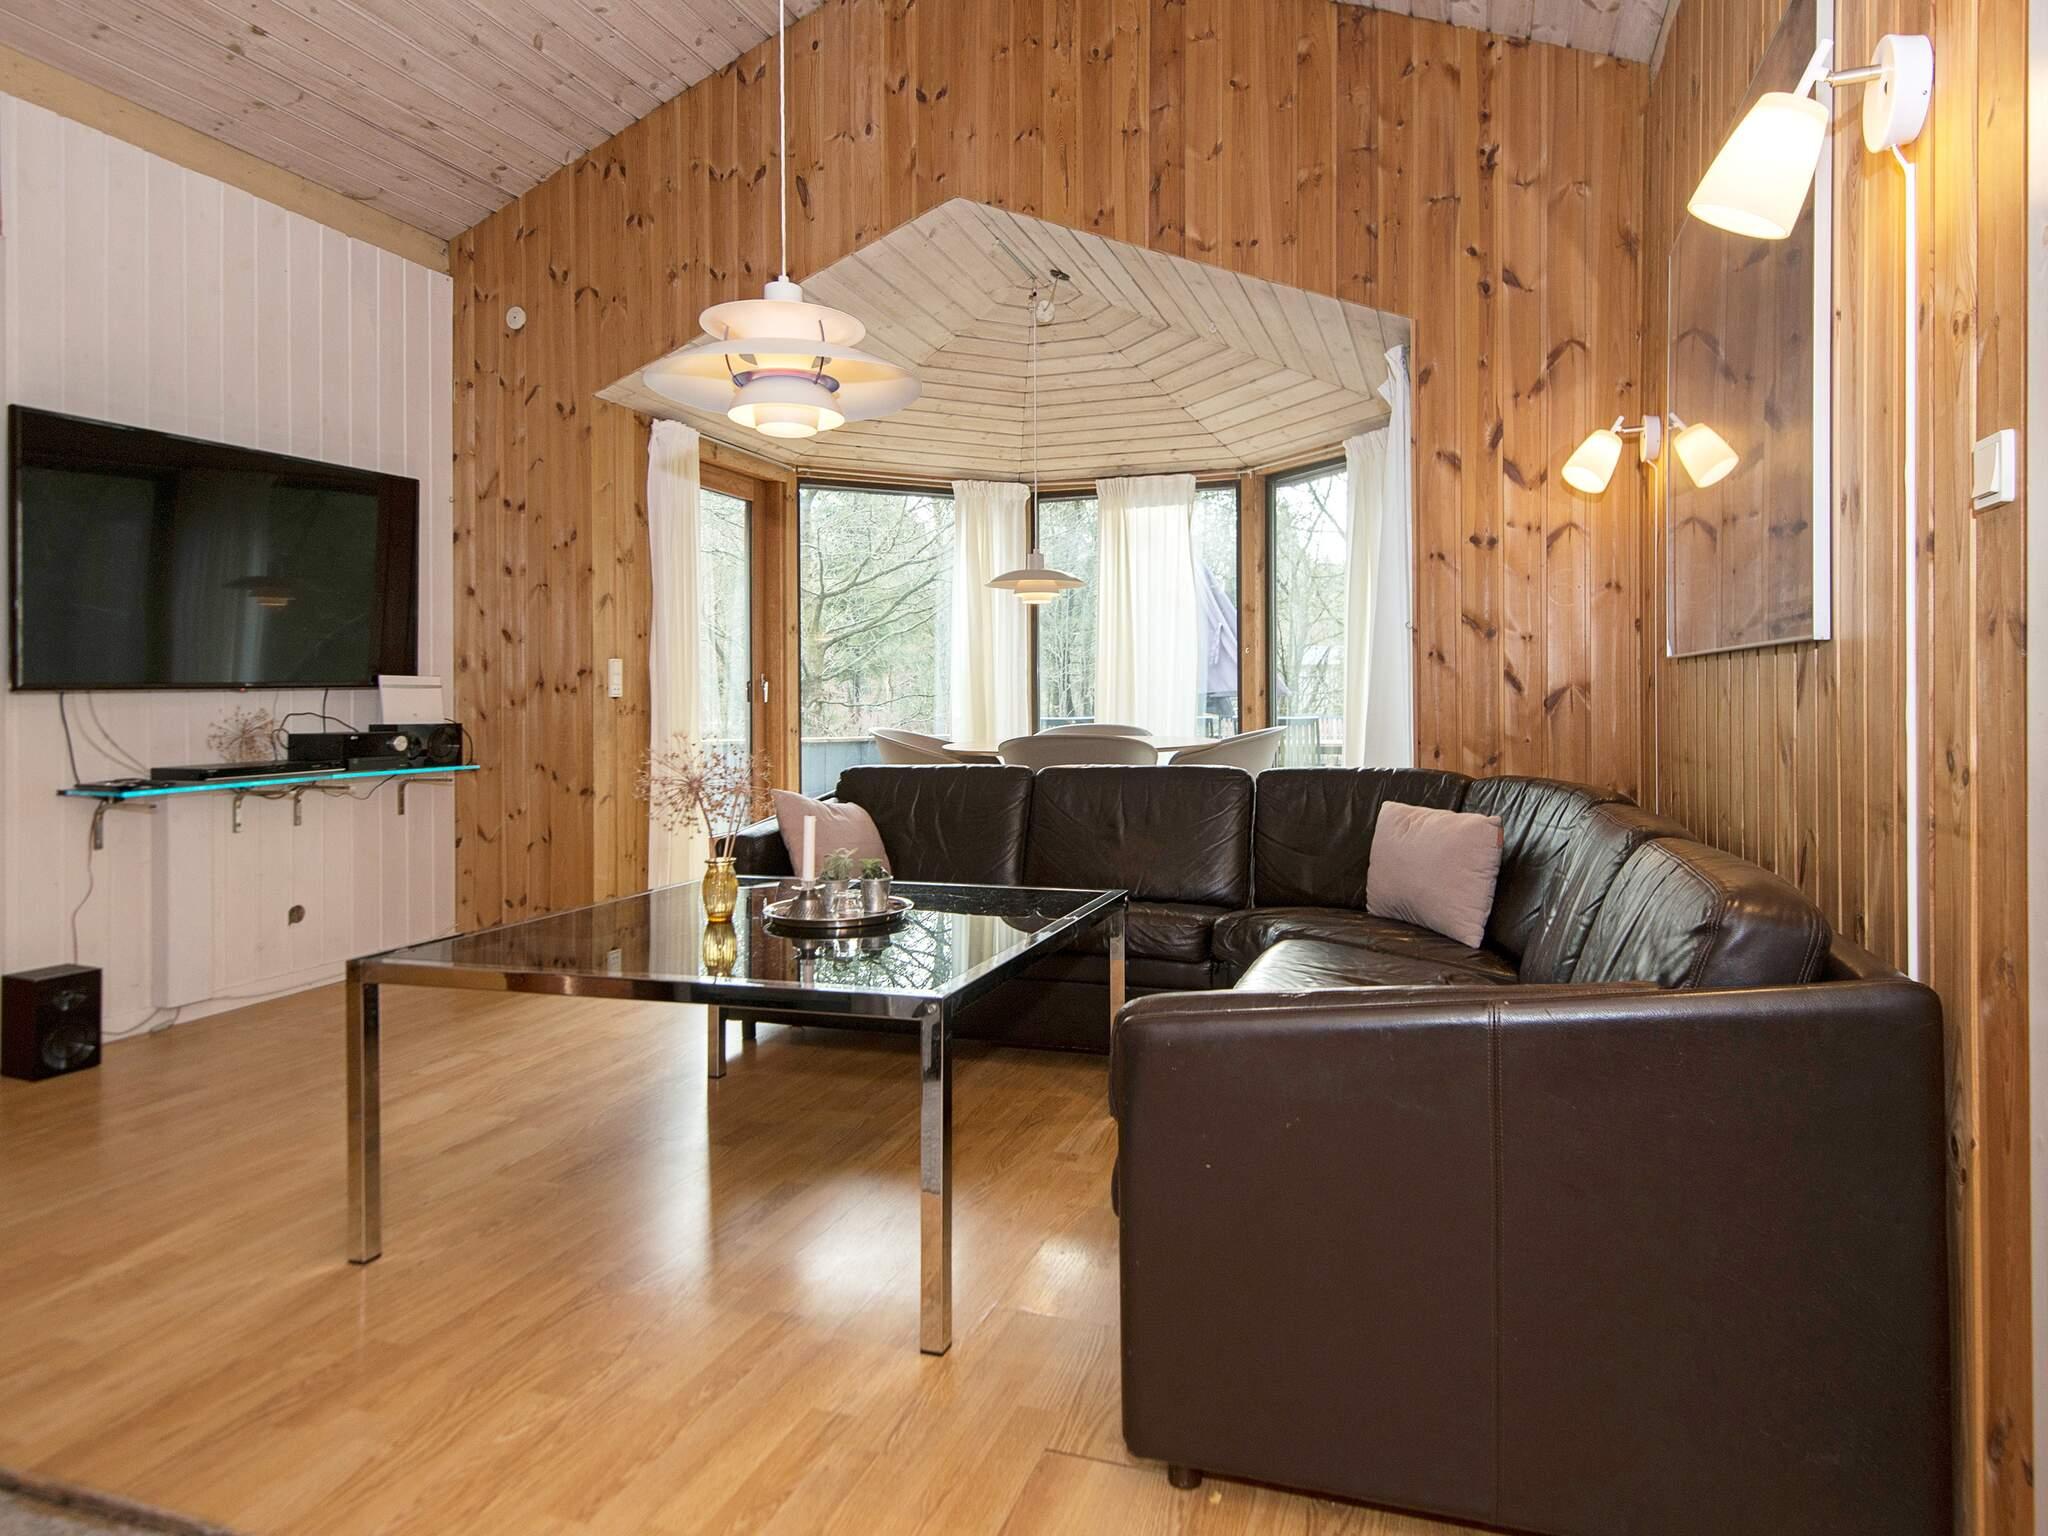 Ferienhaus Kølkær (87697), Kølkær, , Westjütland, Dänemark, Bild 9